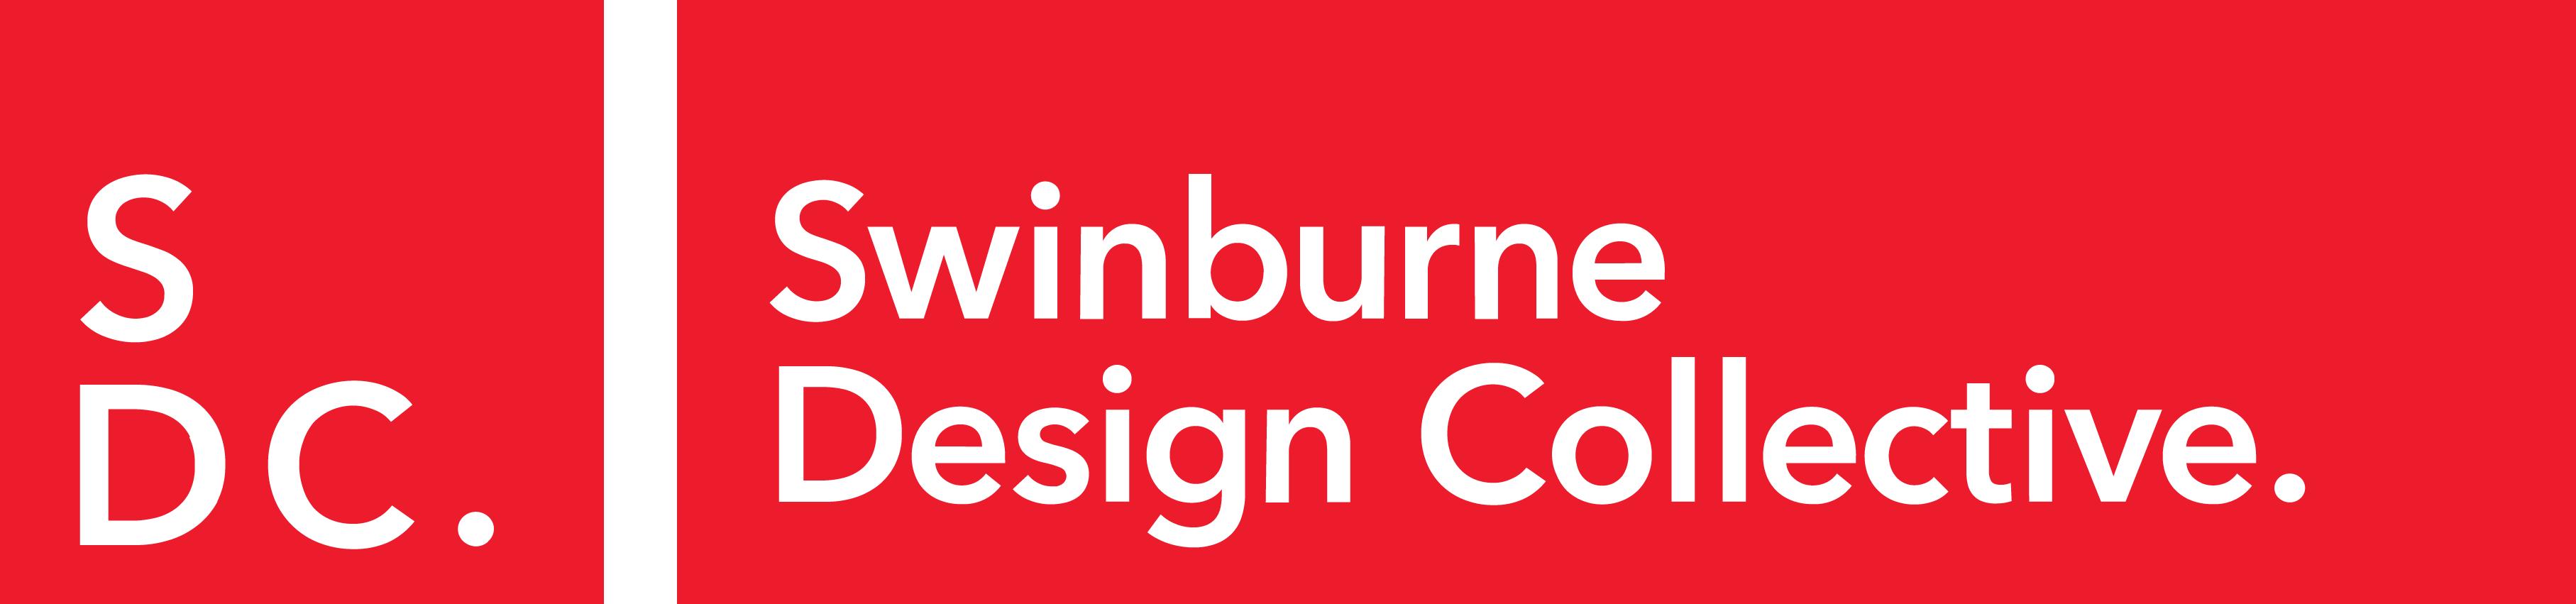 Swinburne Design Collective